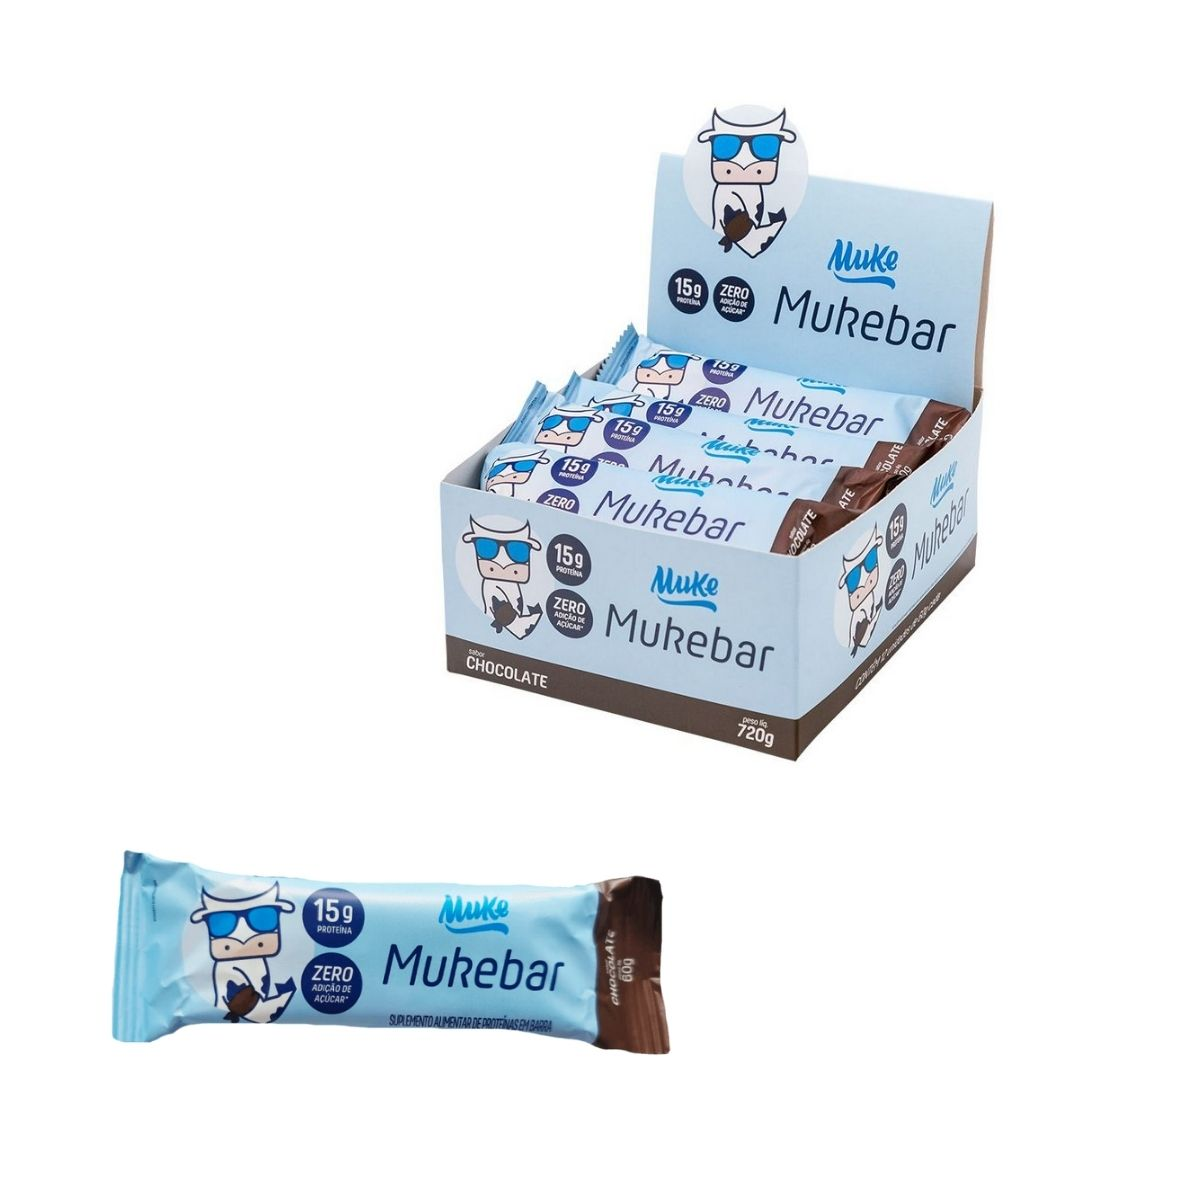 Mukebar chocolate 720g 12 unidades - Muke